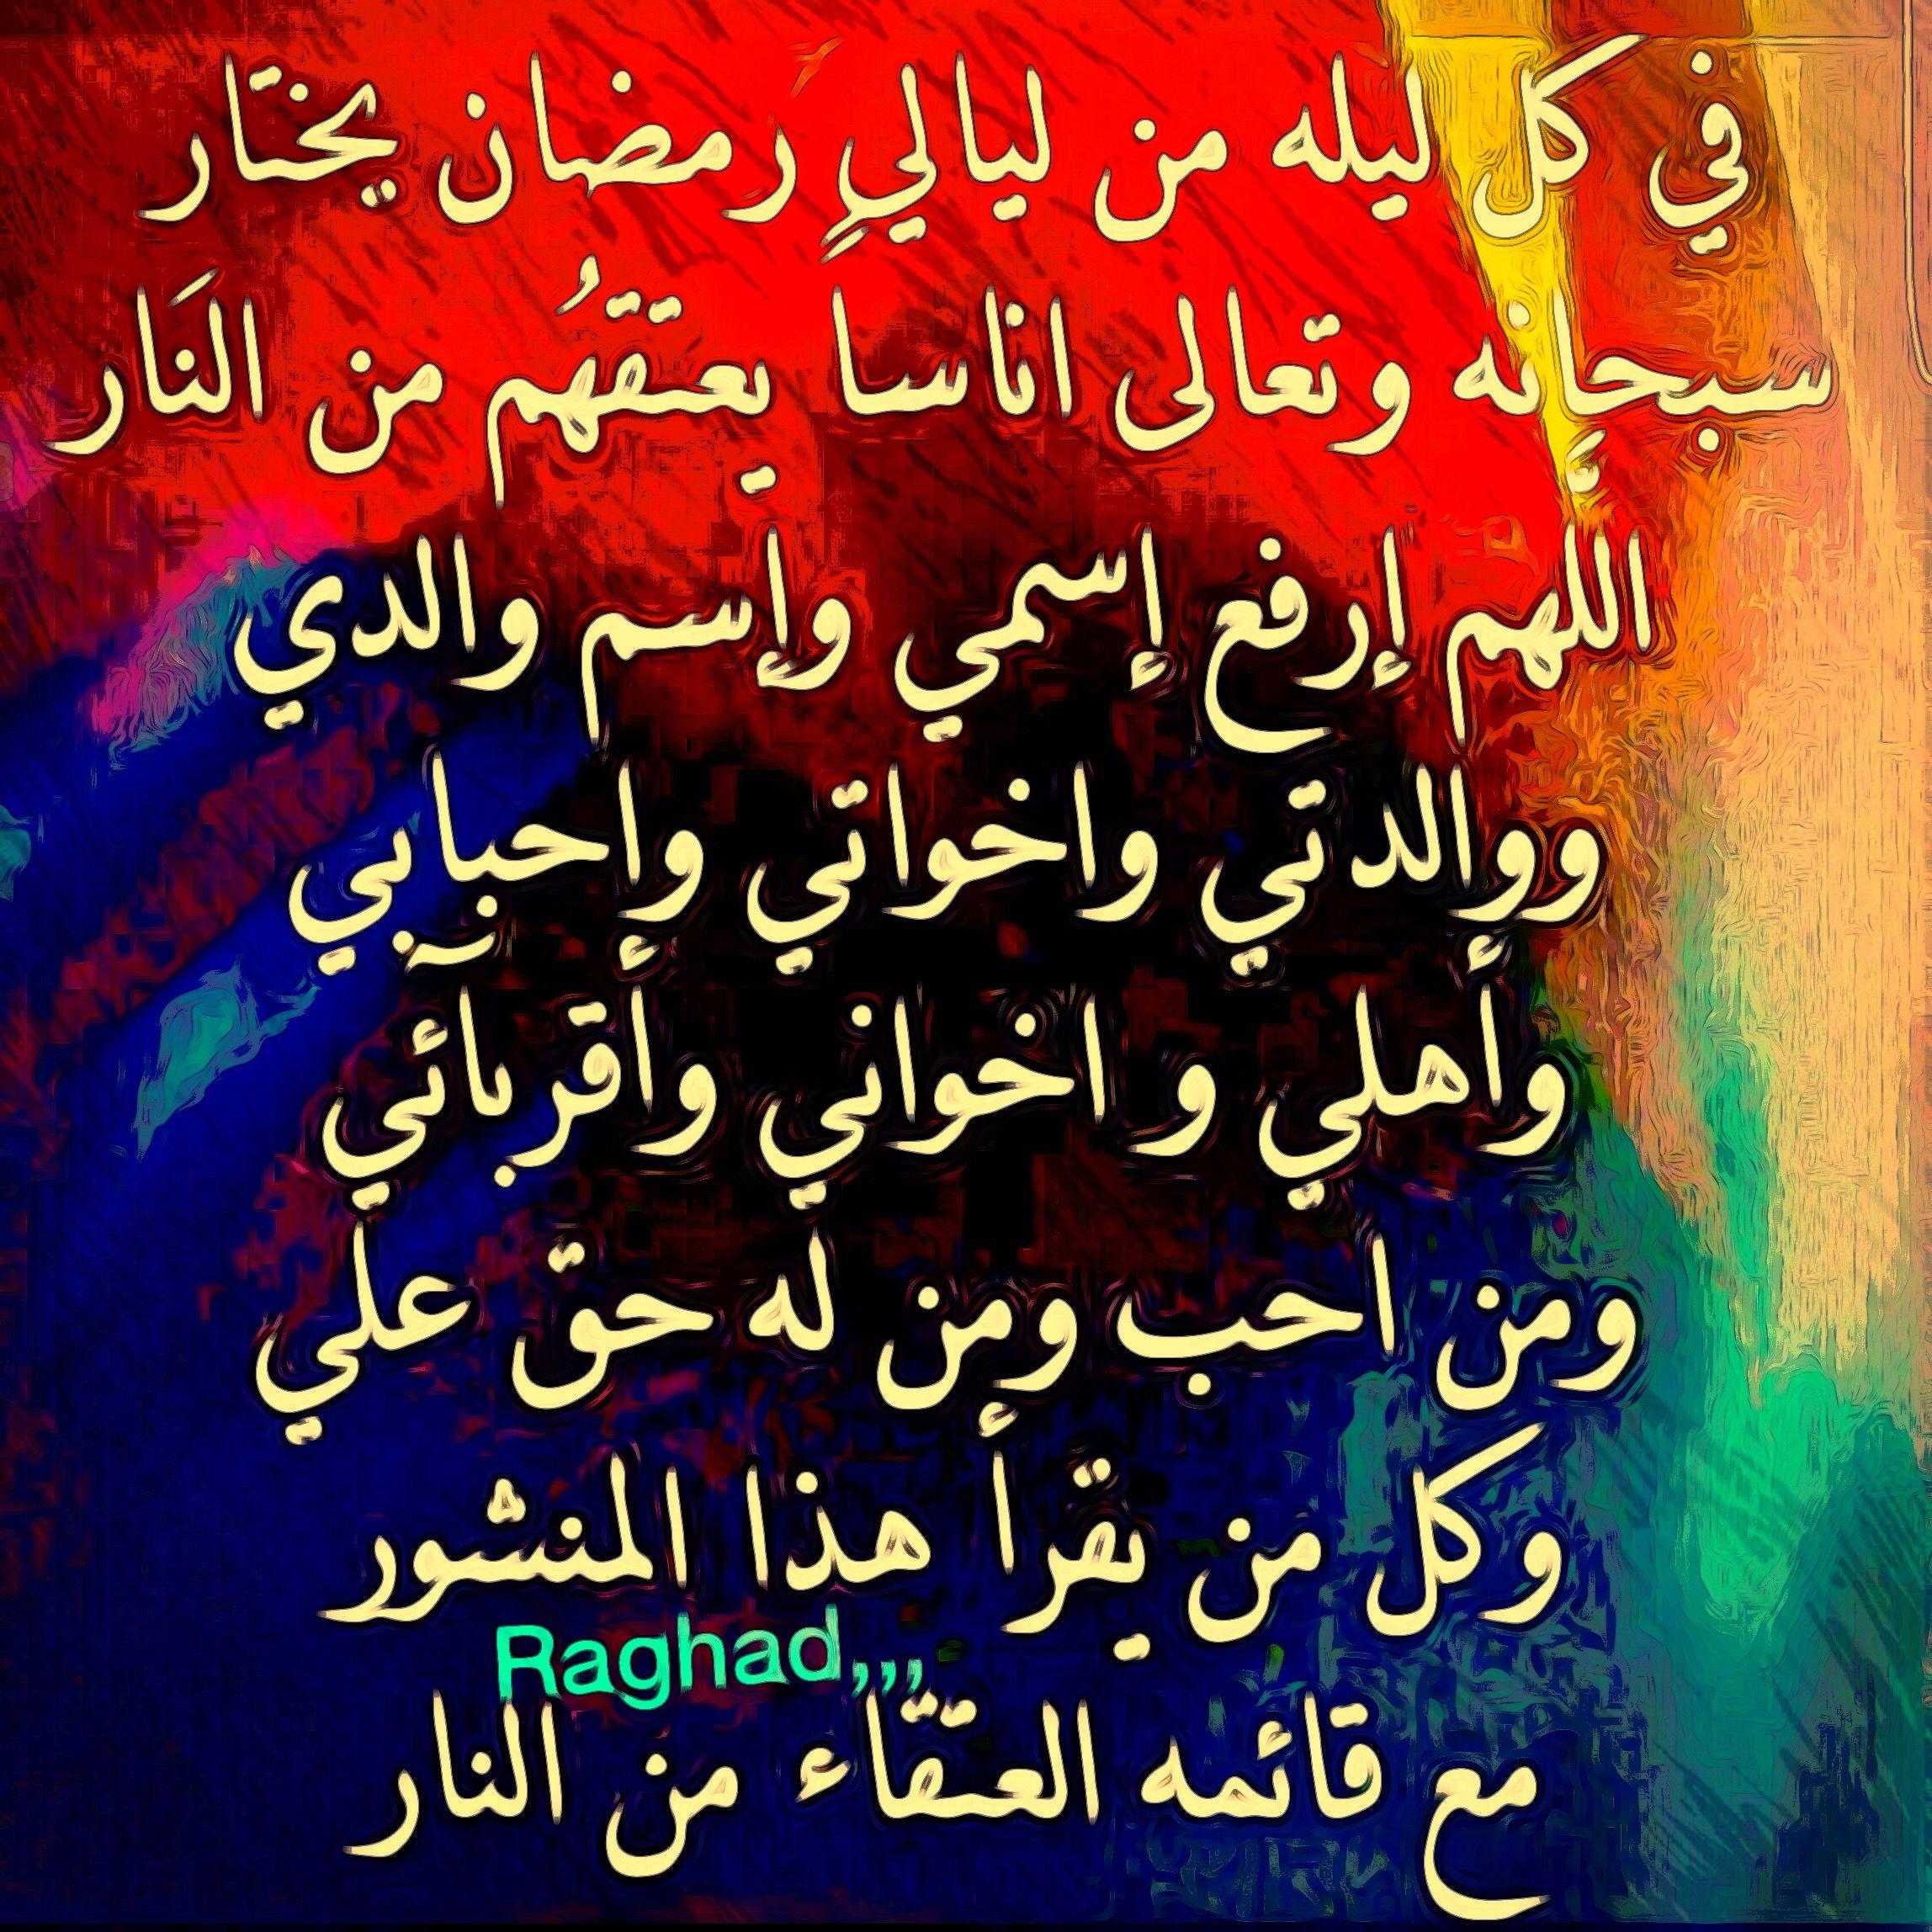 Desertrose اللهم ربنا استجابة وتسهيل ا وتوفيق ا وبركة لتلك الدعوات والأمنيات المستودعة بين عظيم لطفك ورحمتك Ramadan Kareem Ramadan Kareem